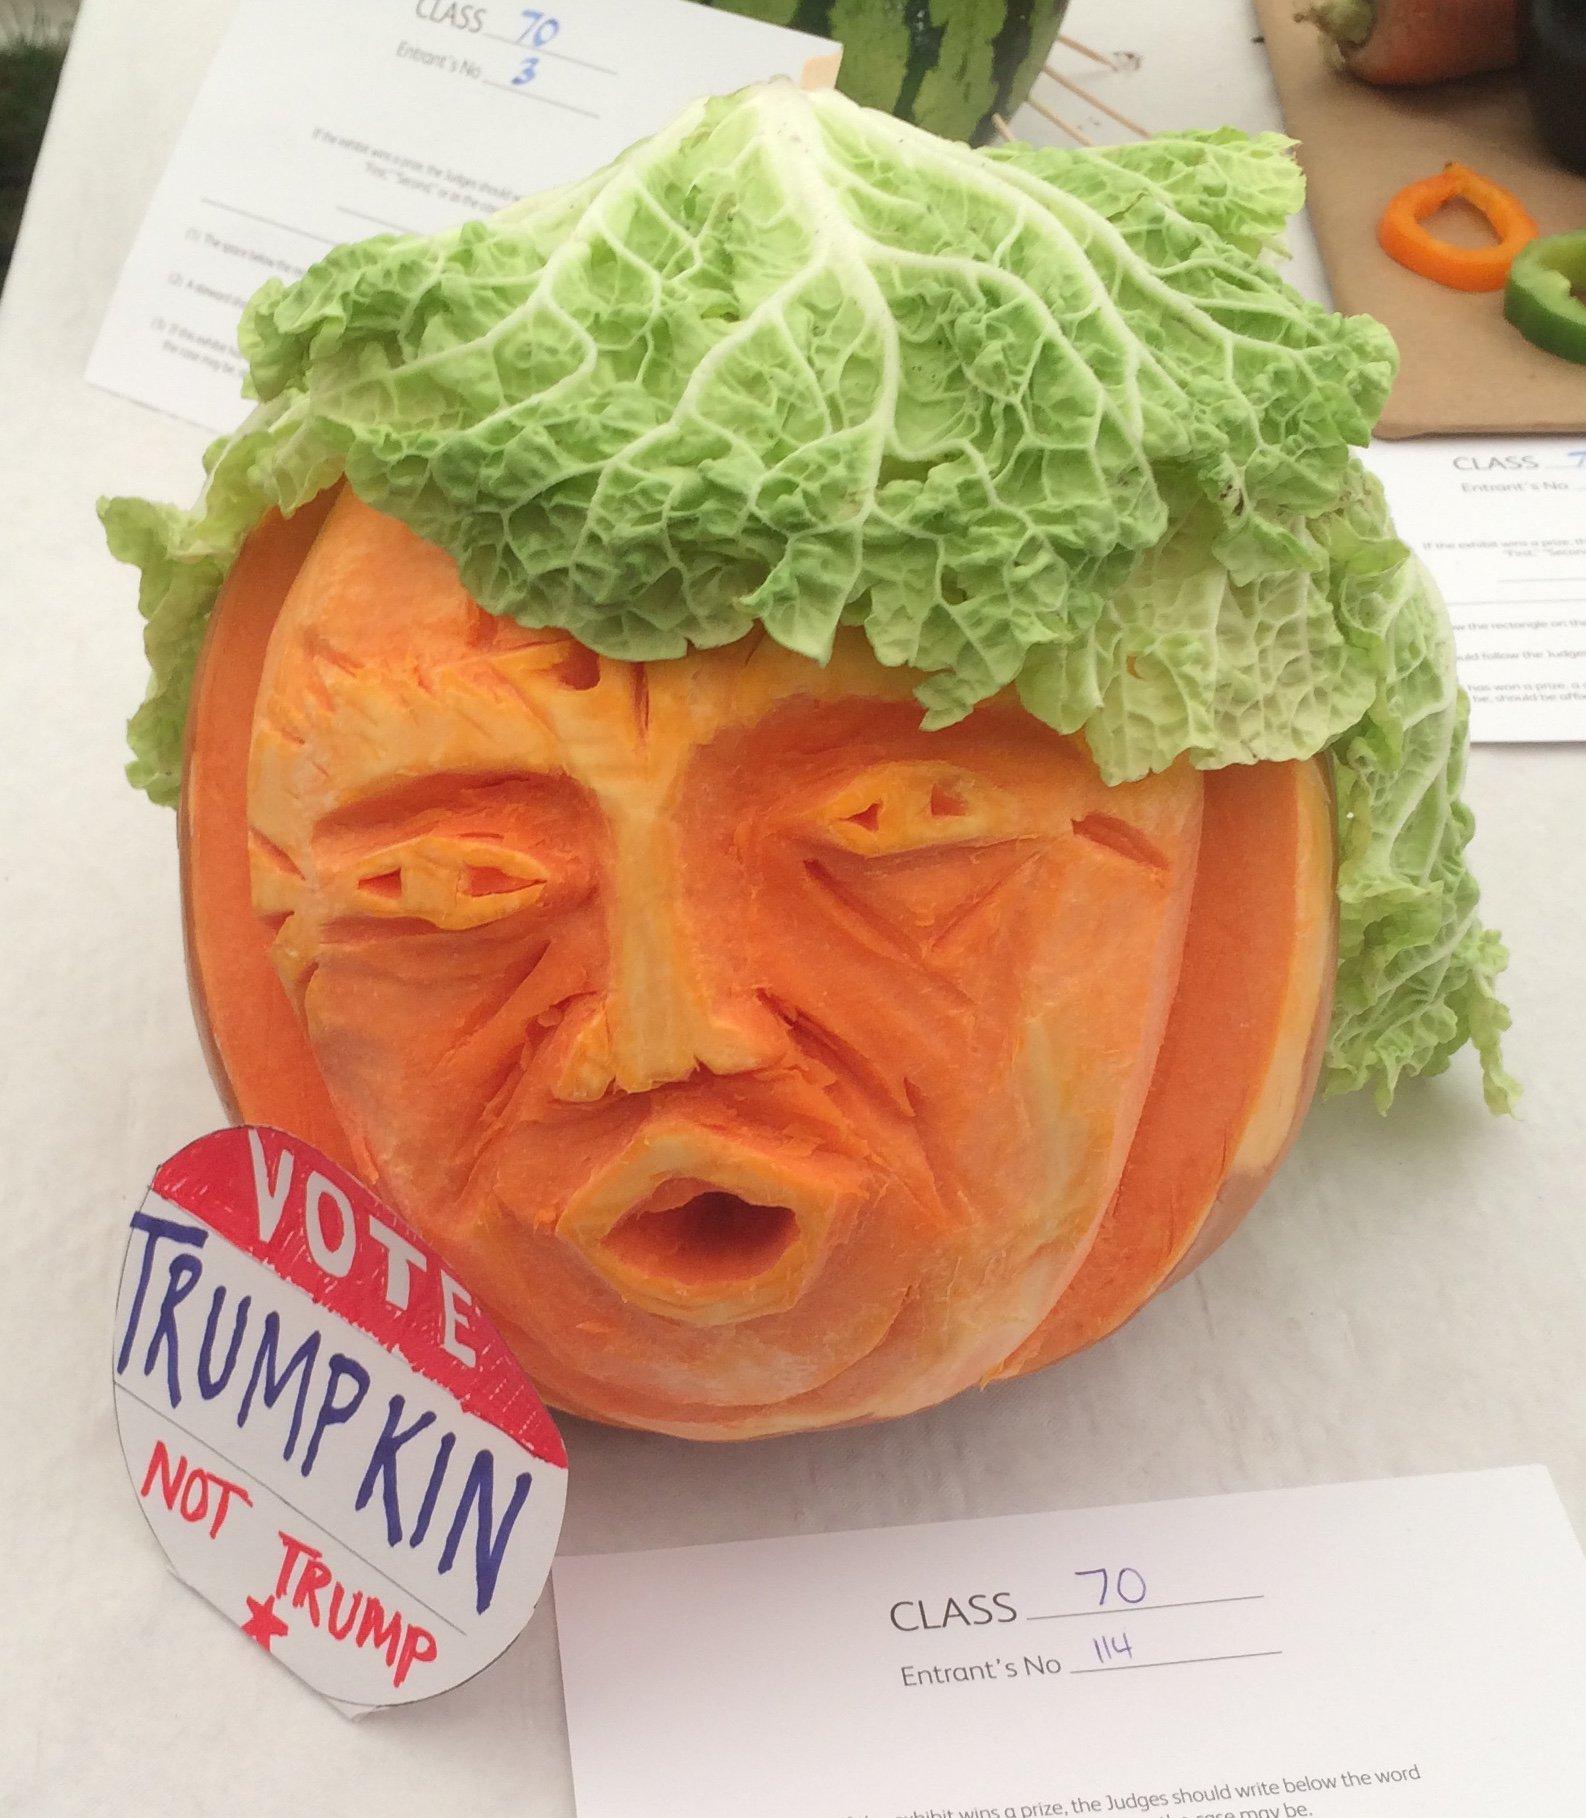 Top Trumps! Reminiscing about last week's #LambethCountryShow veg sculptures! #Trump #wonkyveg https://t.co/CKGK9vNq12